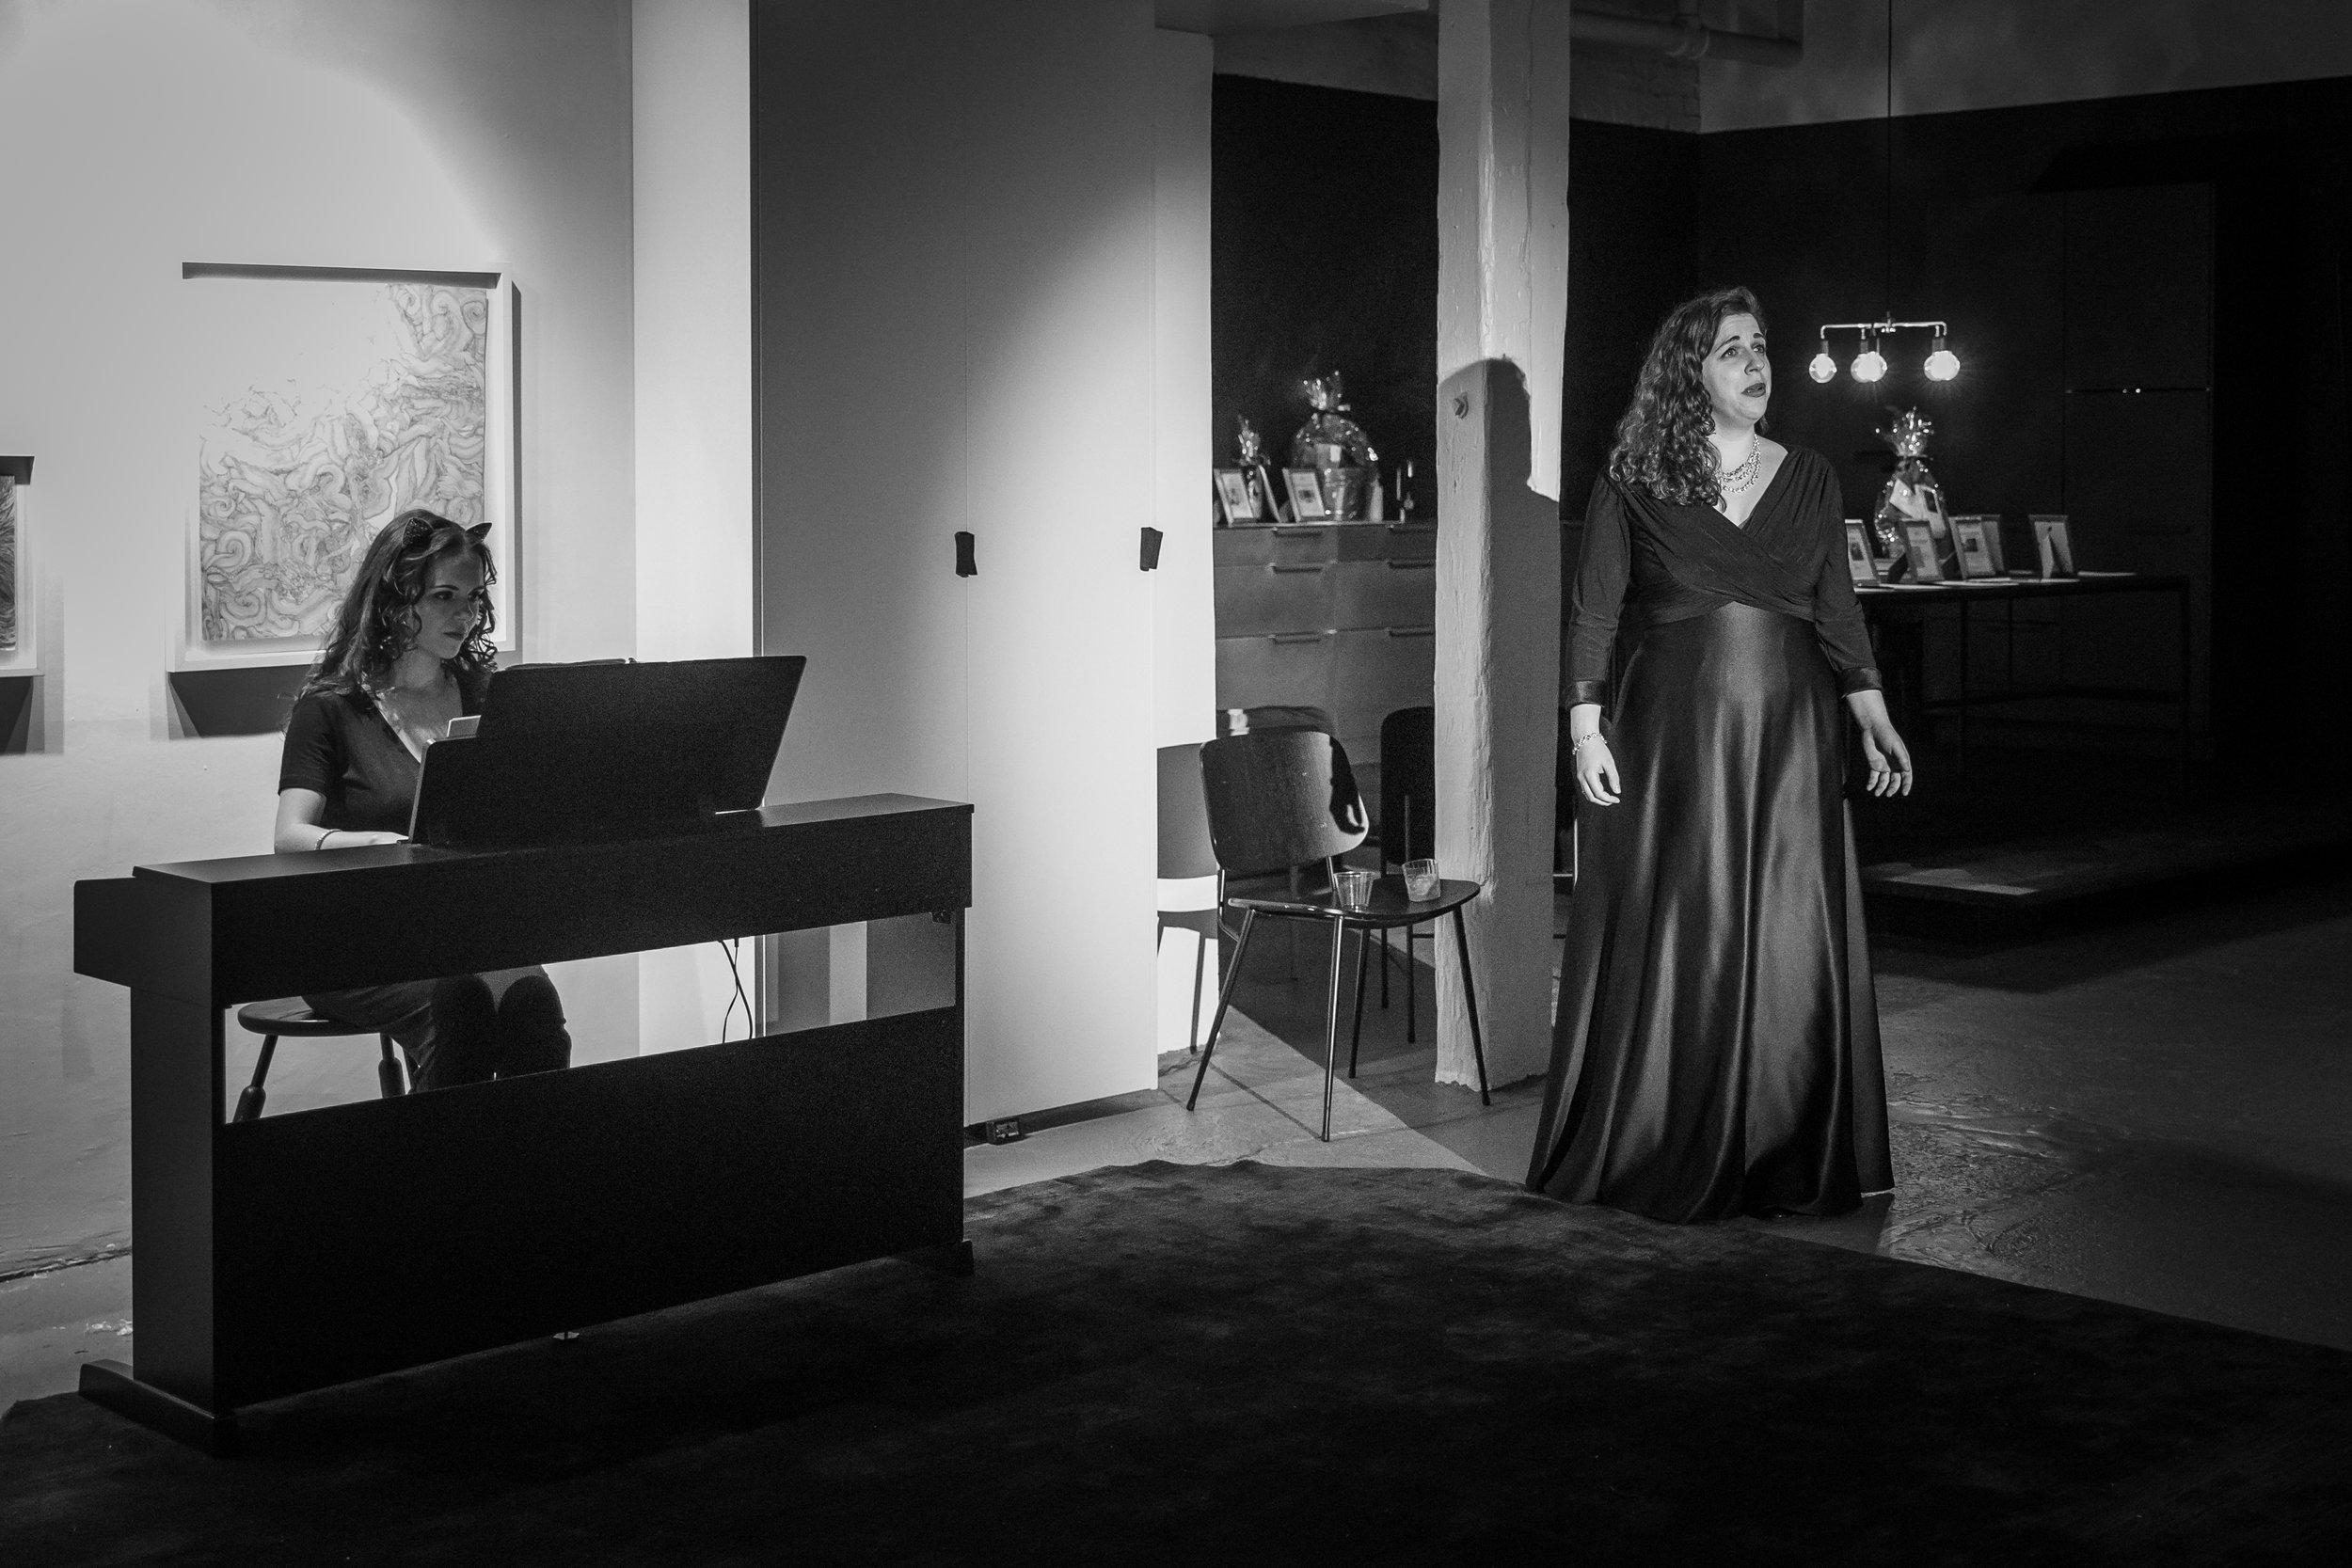 20171026 - Bare Opera's 3rd Annual Gala Event 0032.jpg